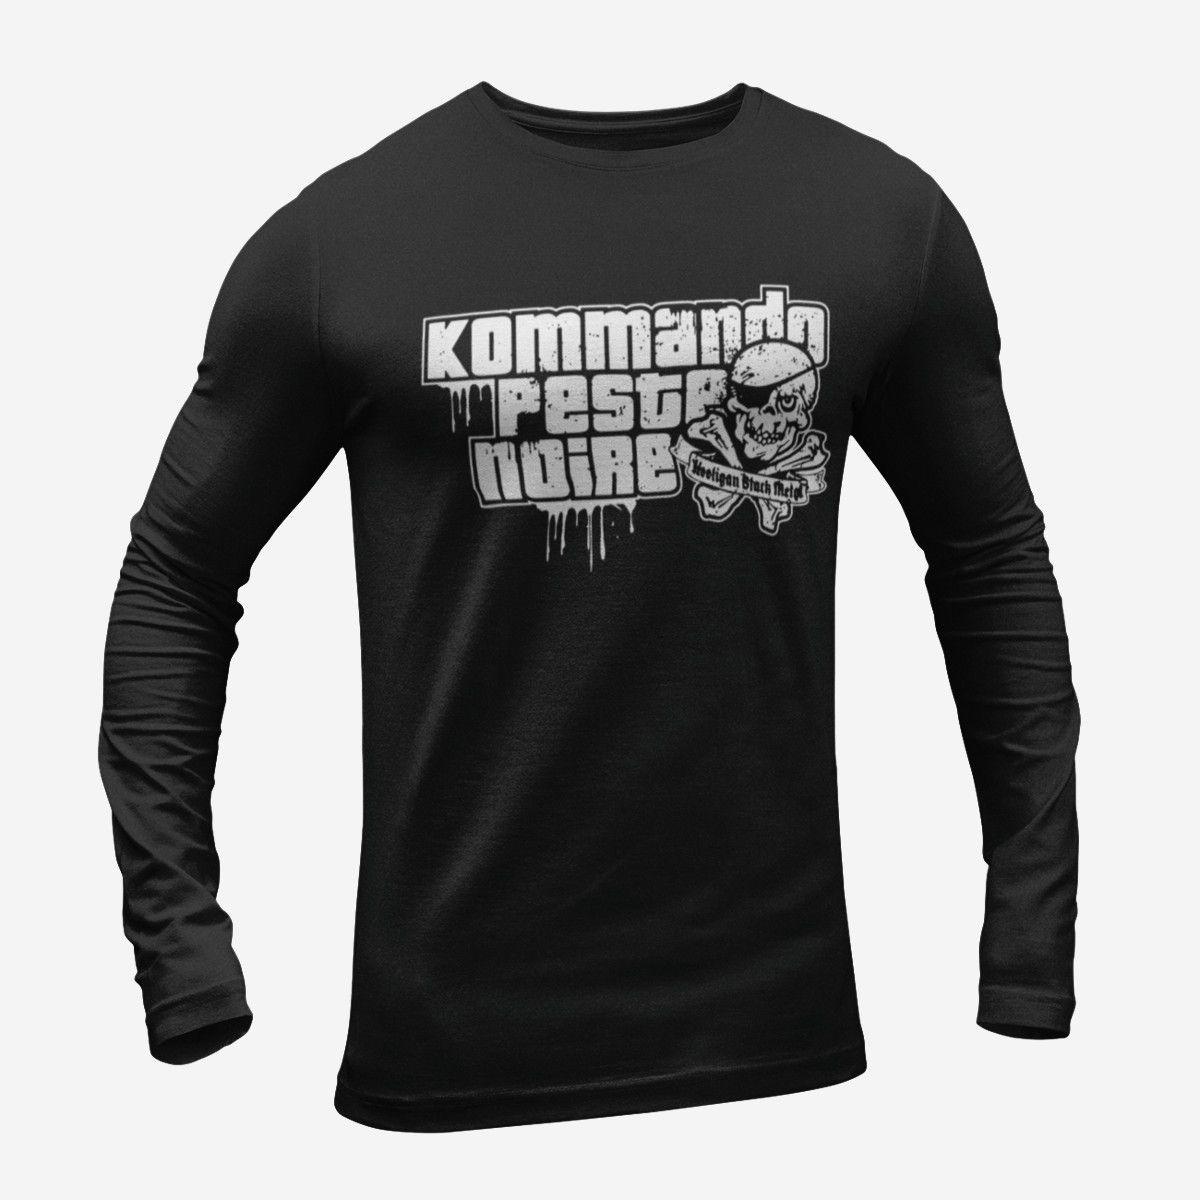 Peste Noire Kommando Long Sleeve T-Shirt, Black Metal